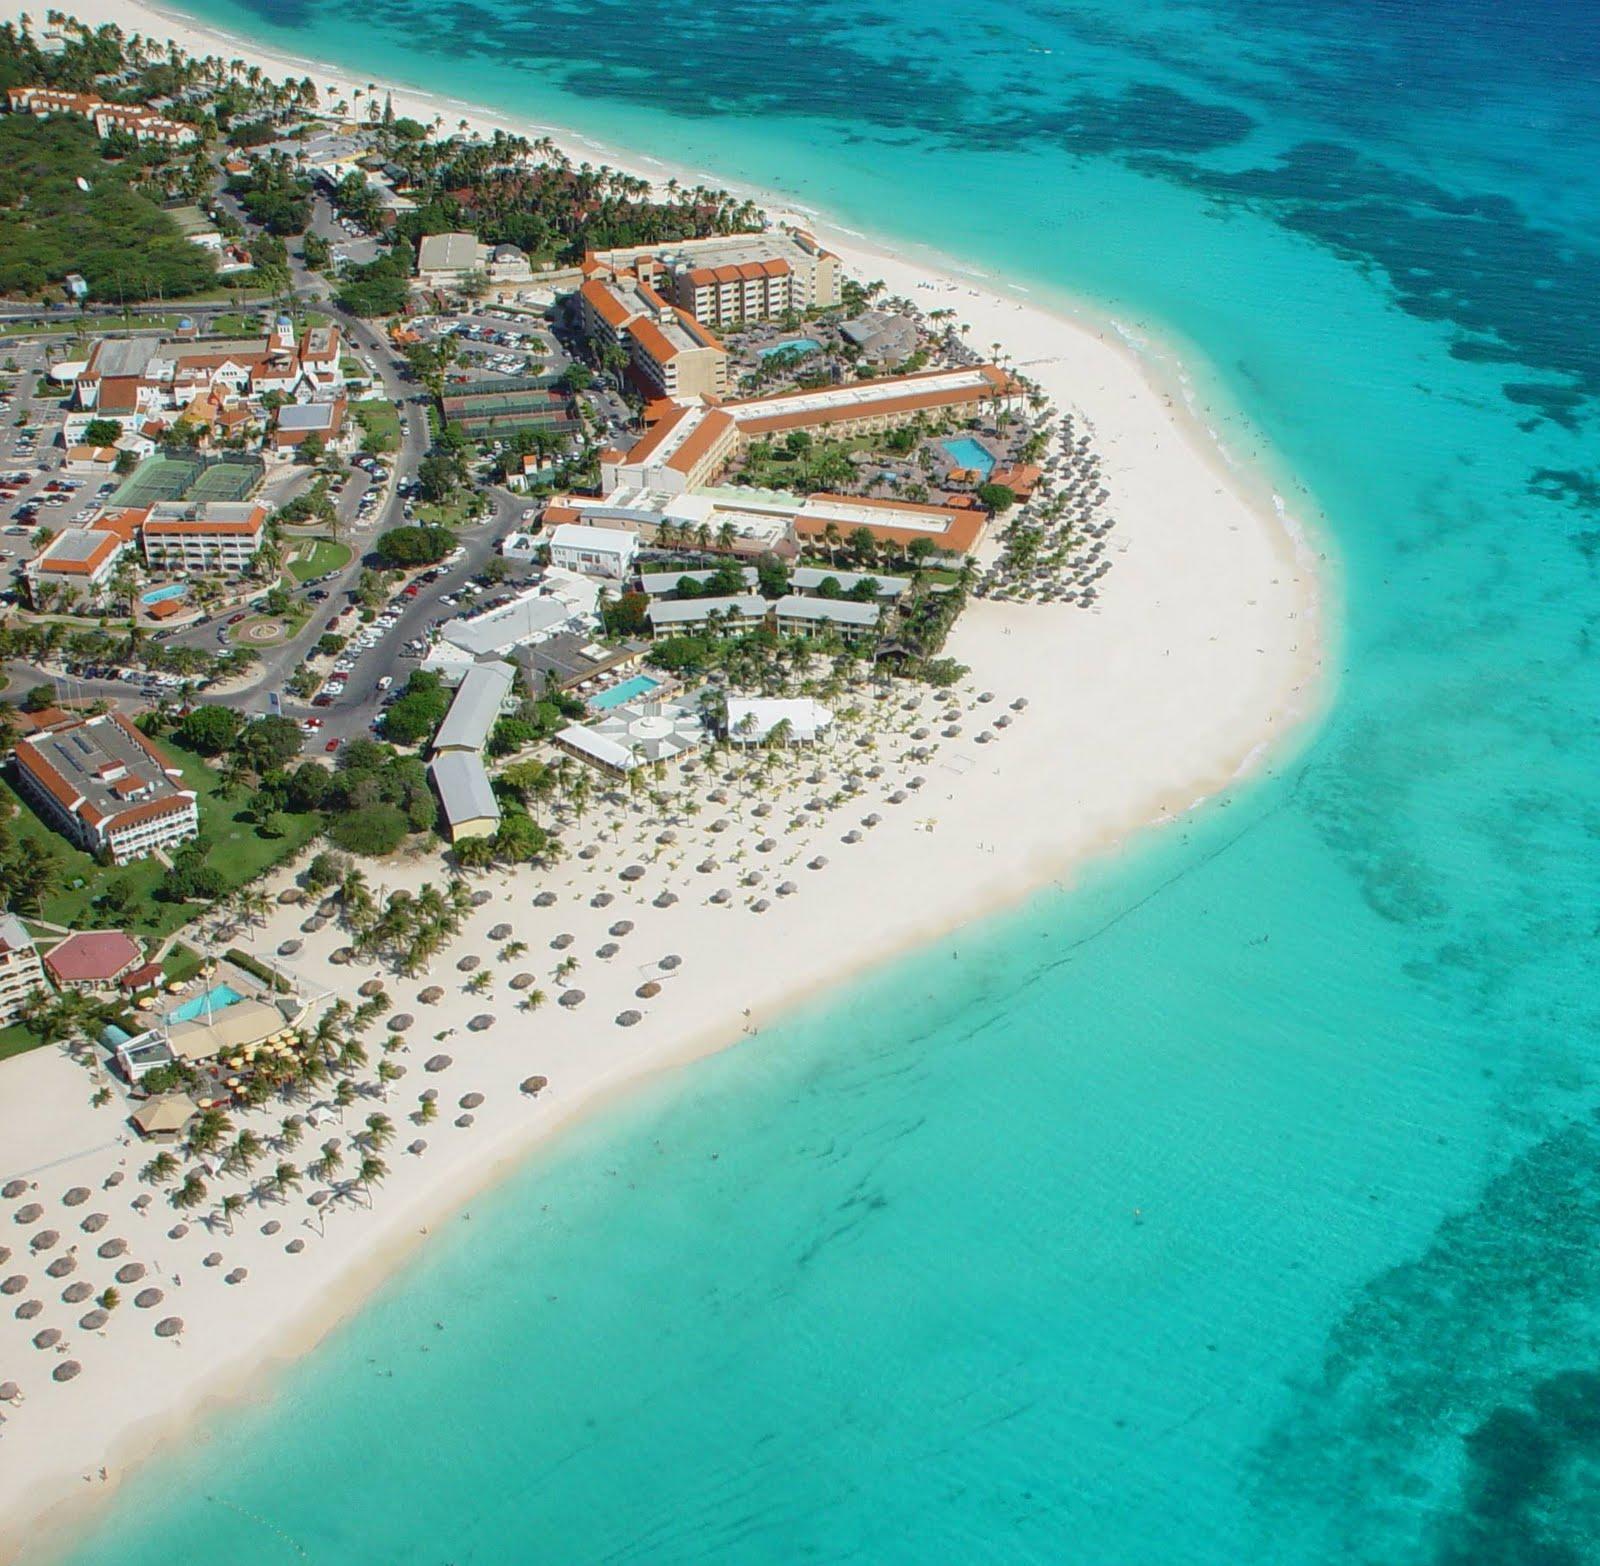 Caribbean Islands: Aruba